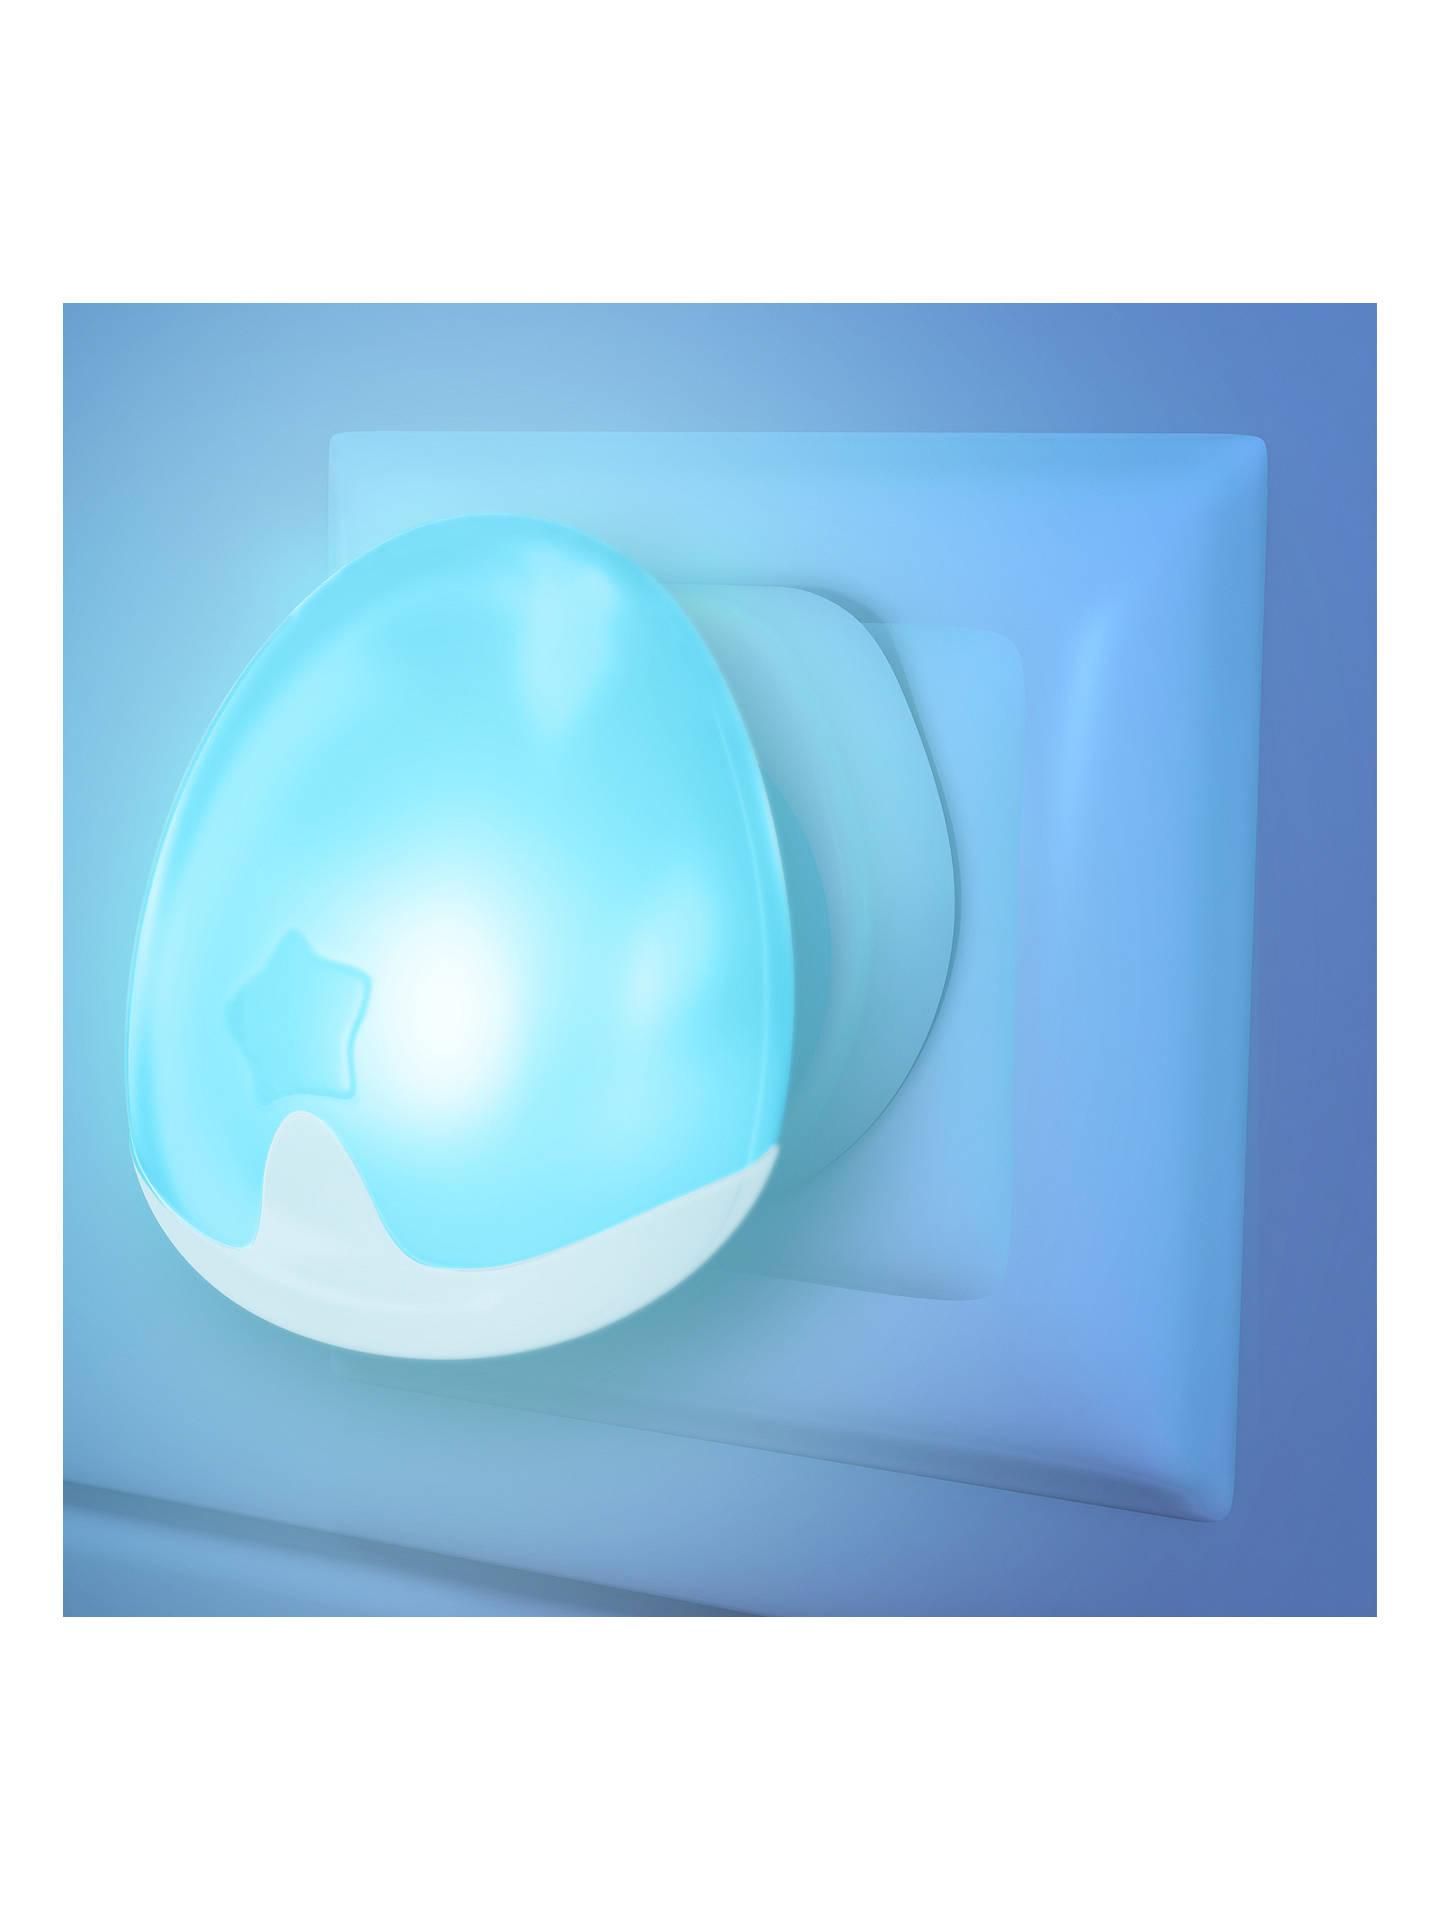 Pabobo Night Light, Blue at John Lewis & Partners